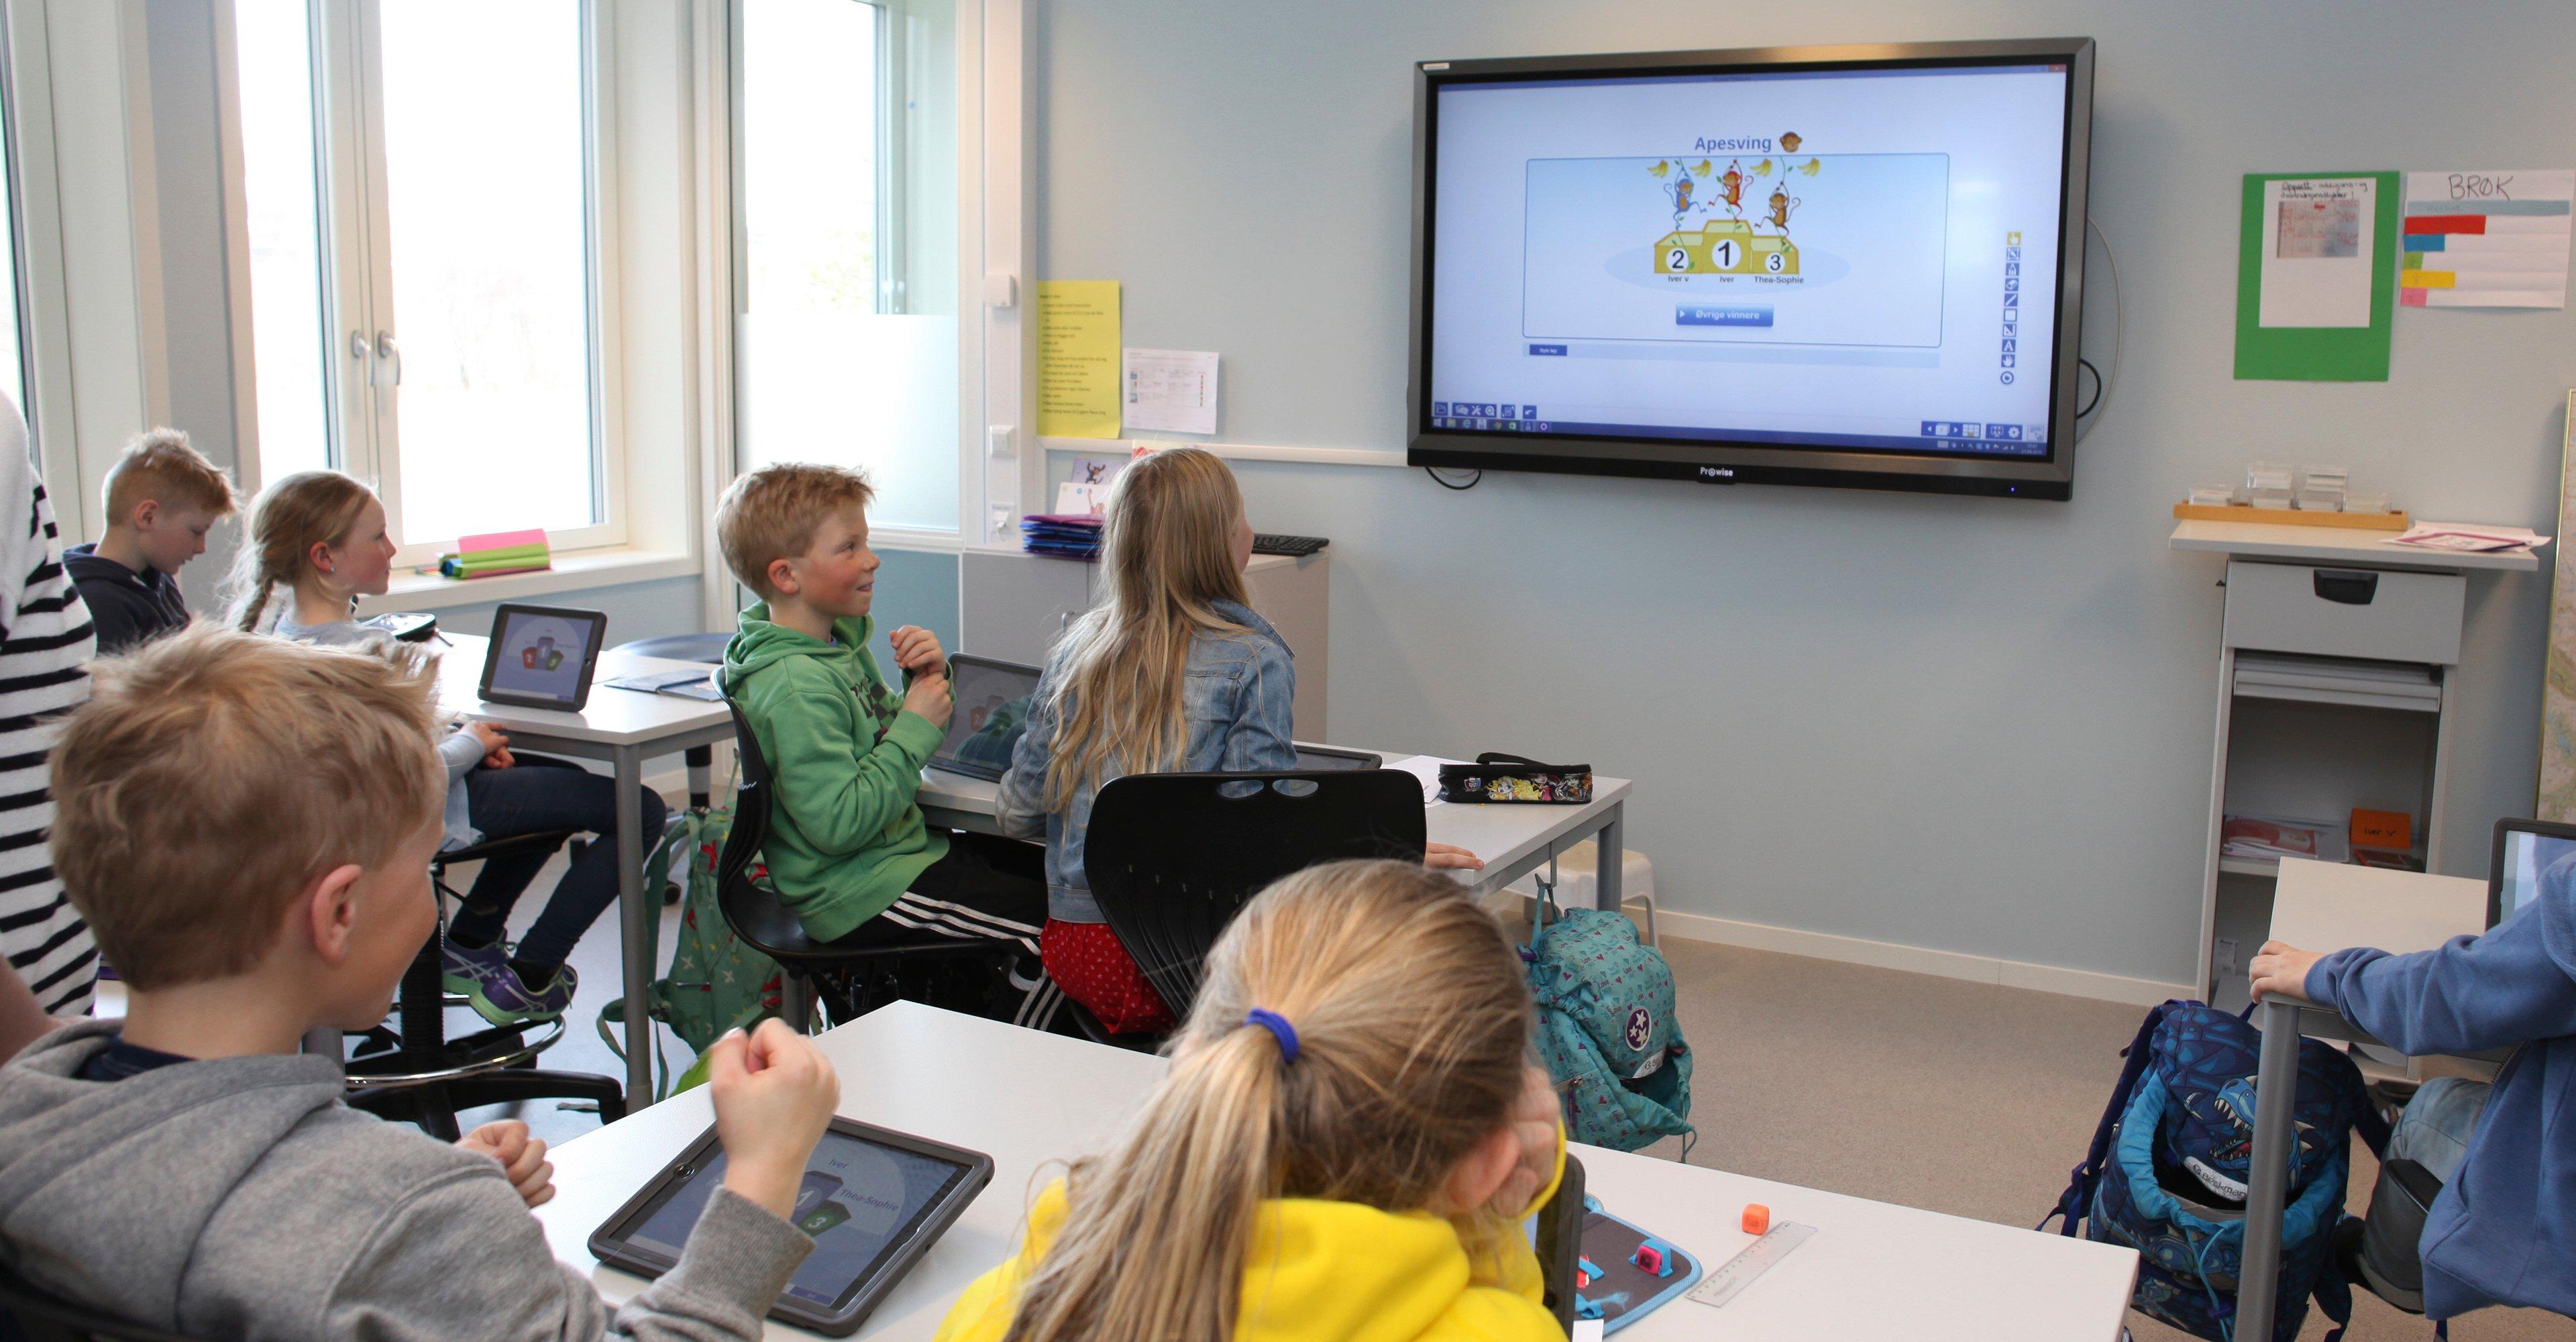 Header Prowise Interaktiv Touchskjerm klasserom